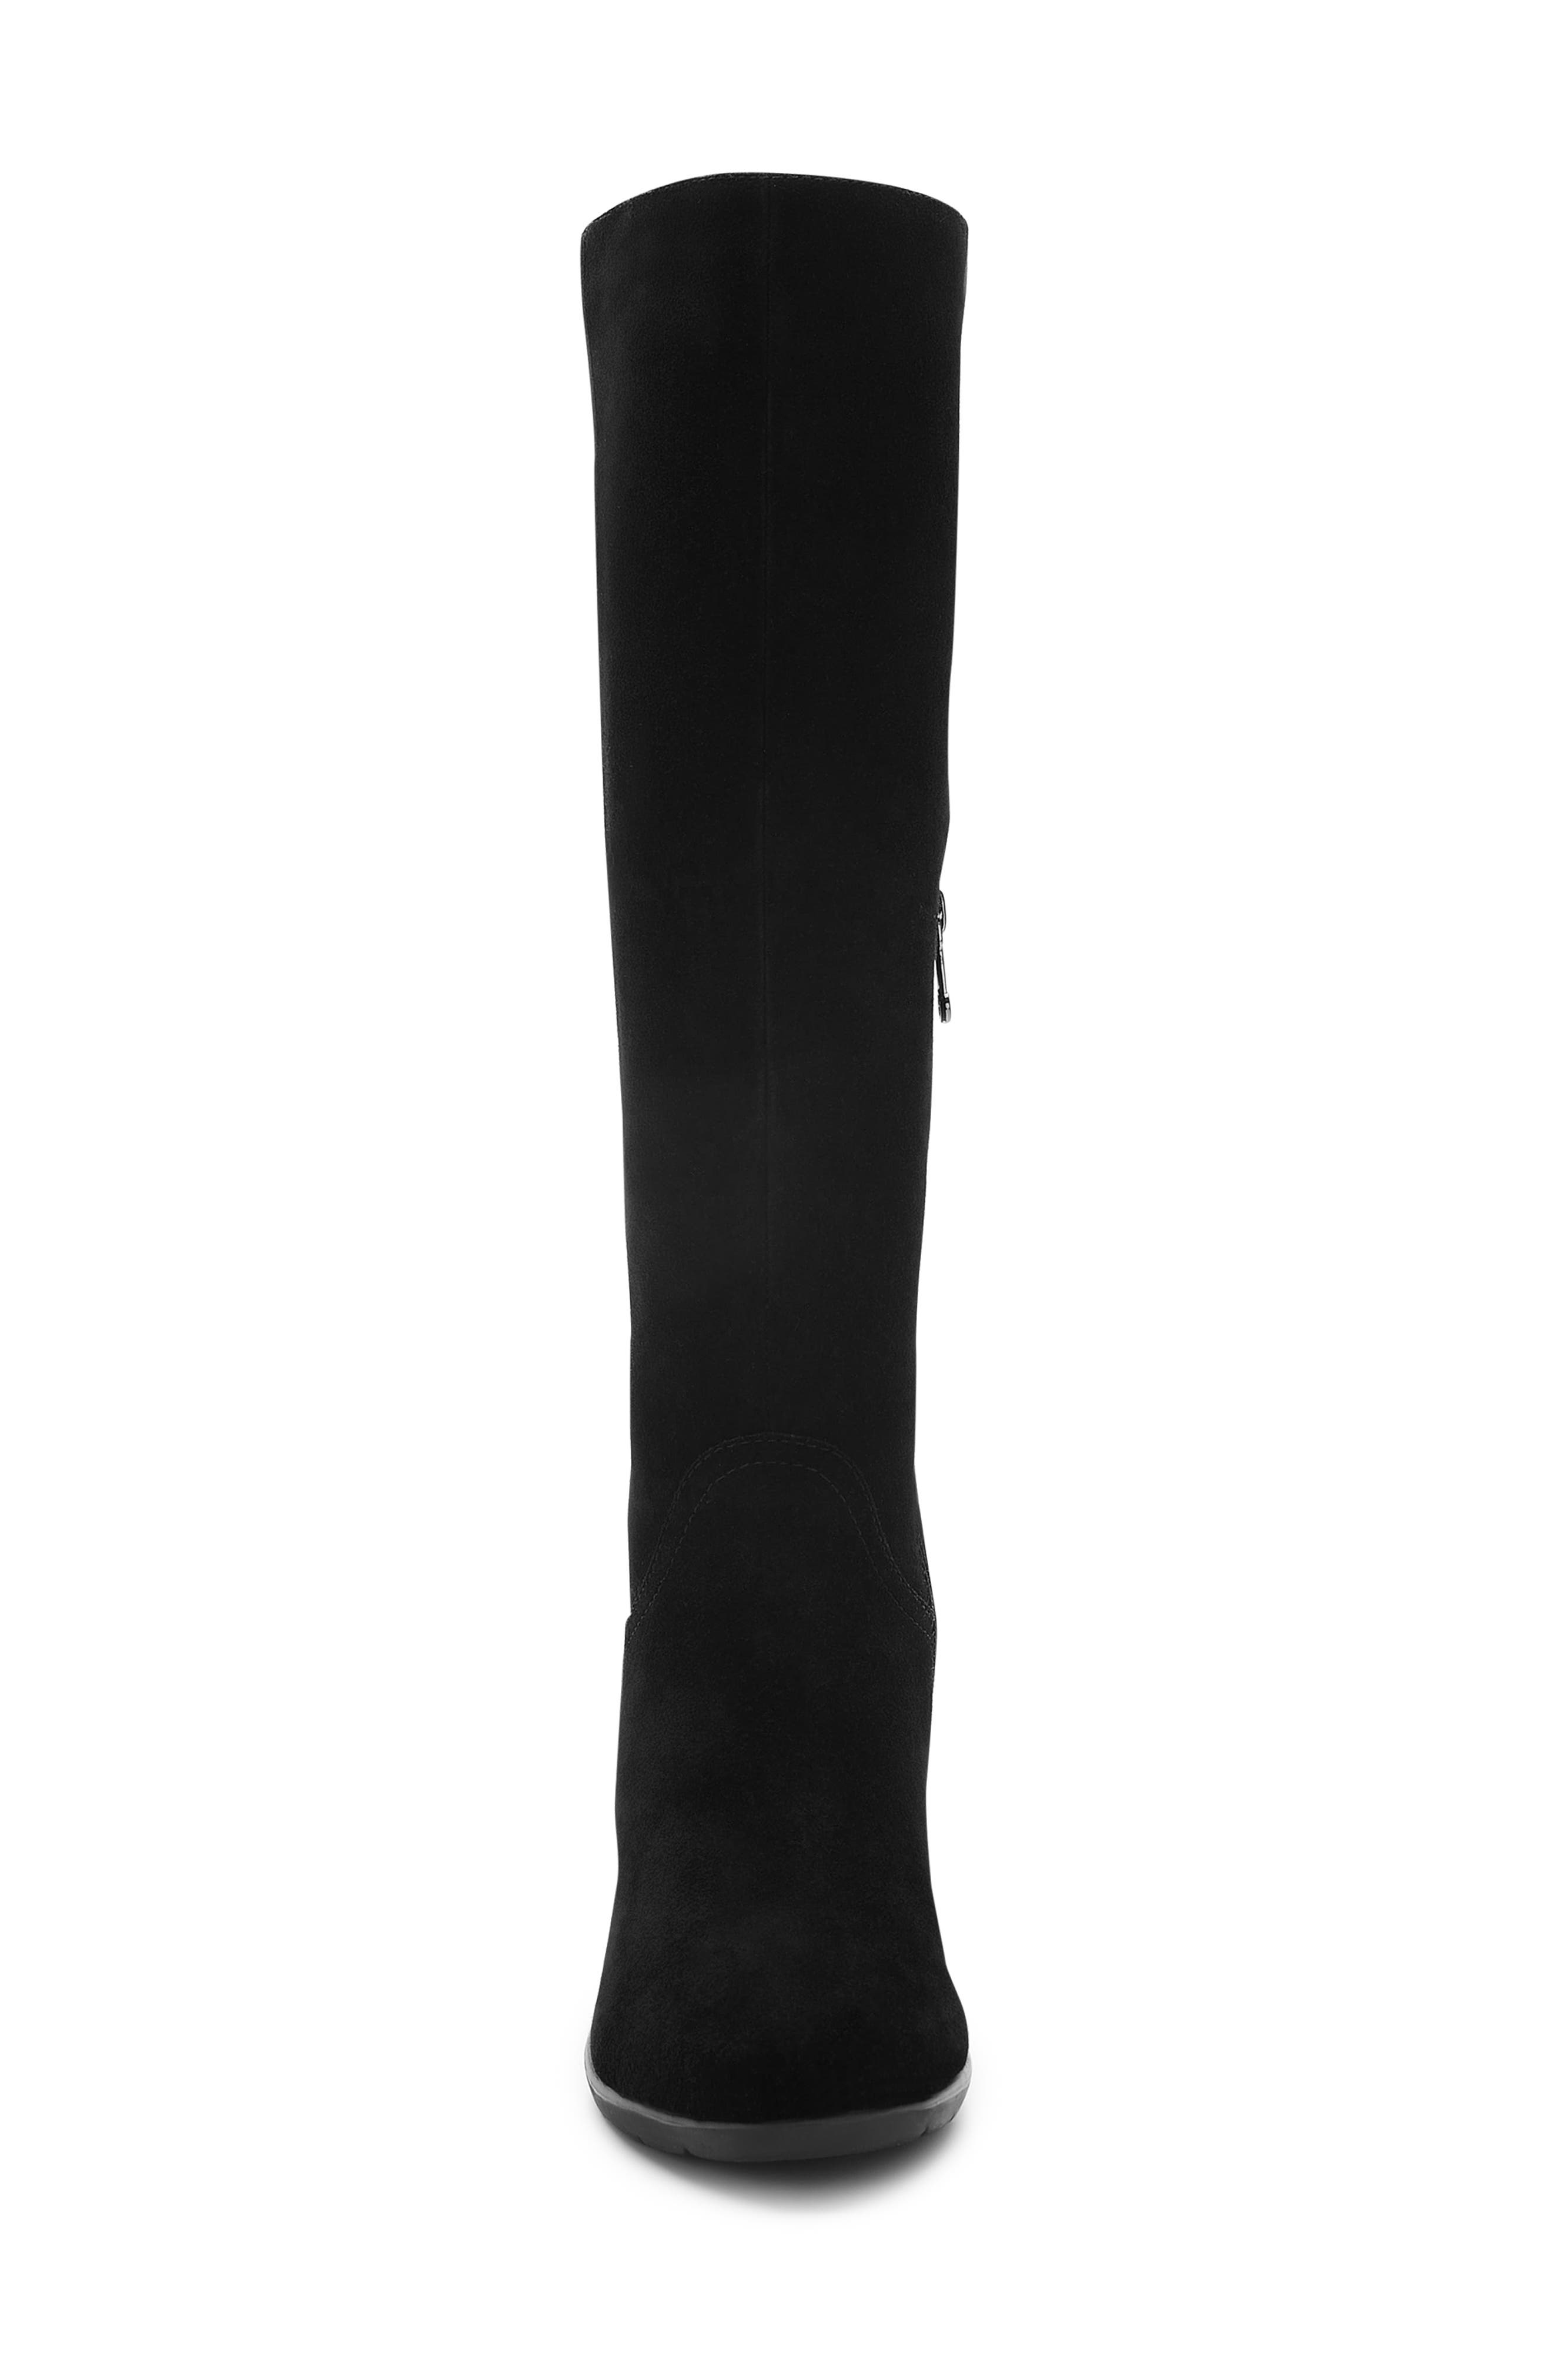 BLONDO, Larissa Waterproof Wedge Knee High Boot, Alternate thumbnail 3, color, BLACK SUEDE